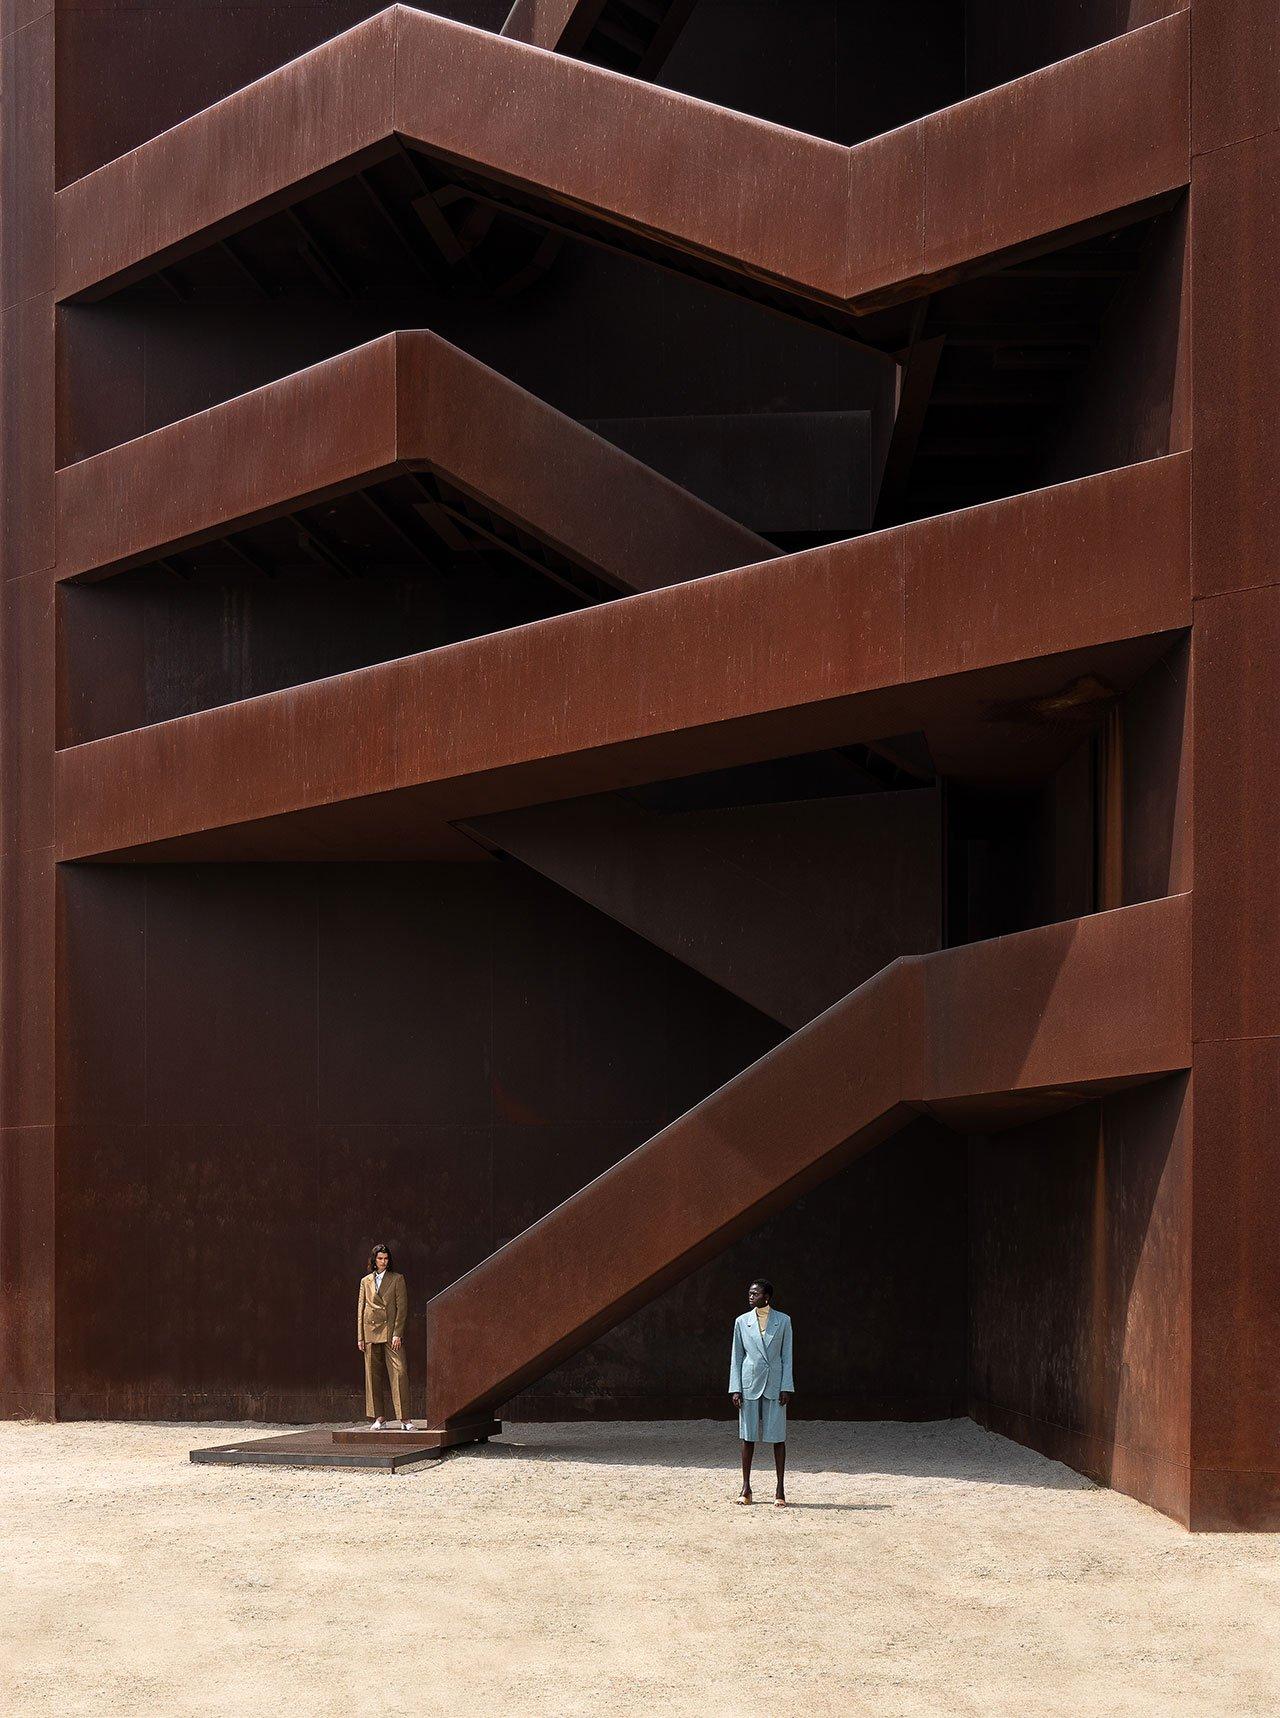 Fashion and Architecture